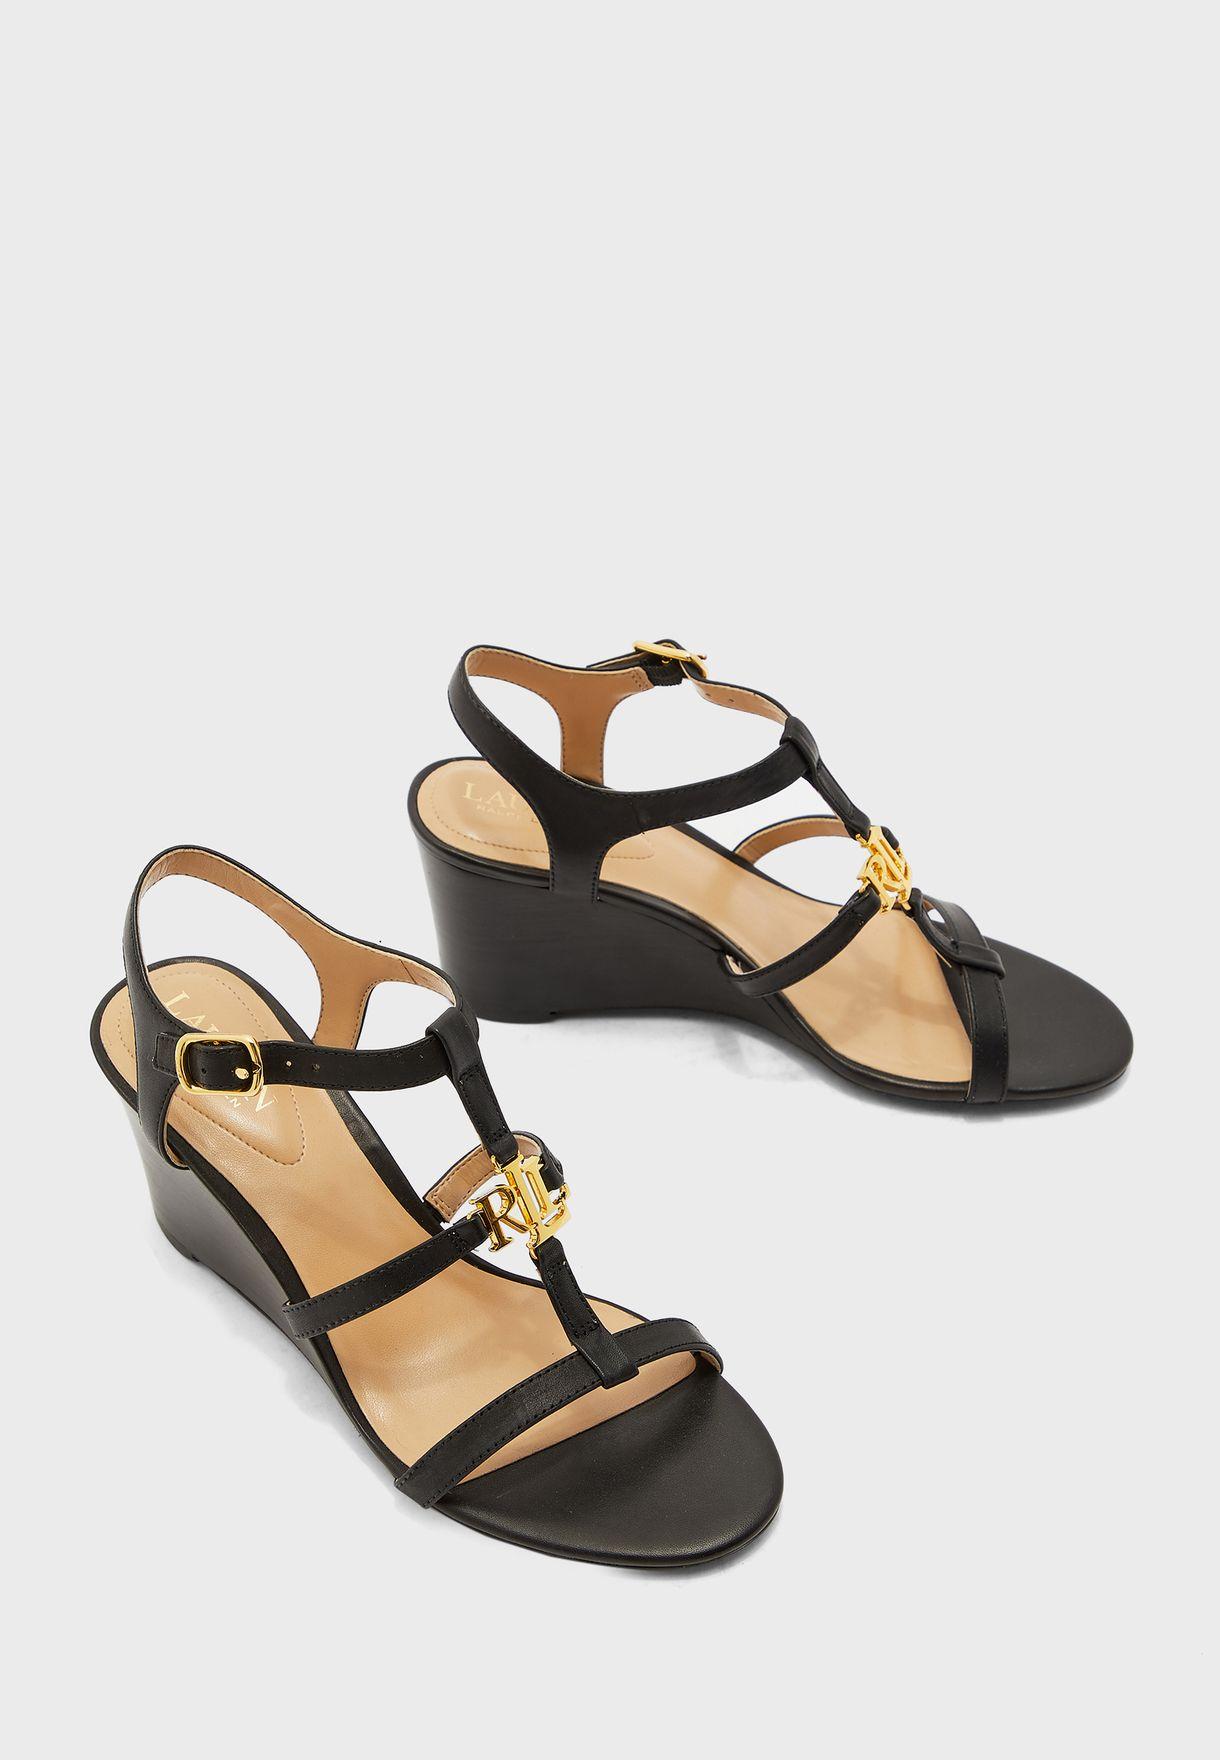 Charlton Ankle Strap Wedge Sandal